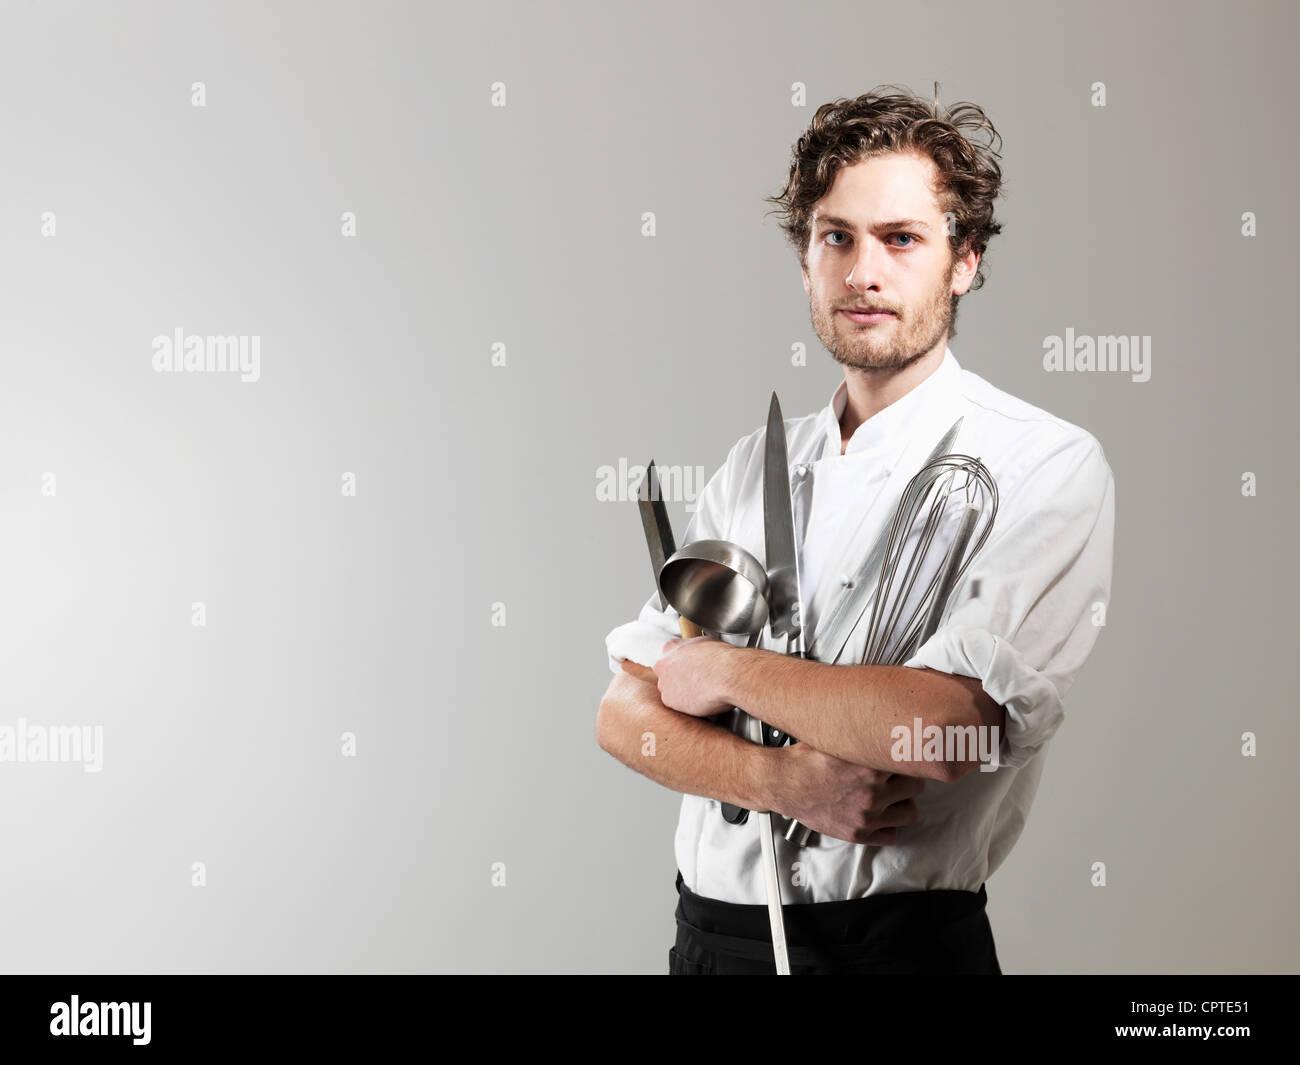 Chef holding ustensiles de cuisine contre fond blanc Photo Stock